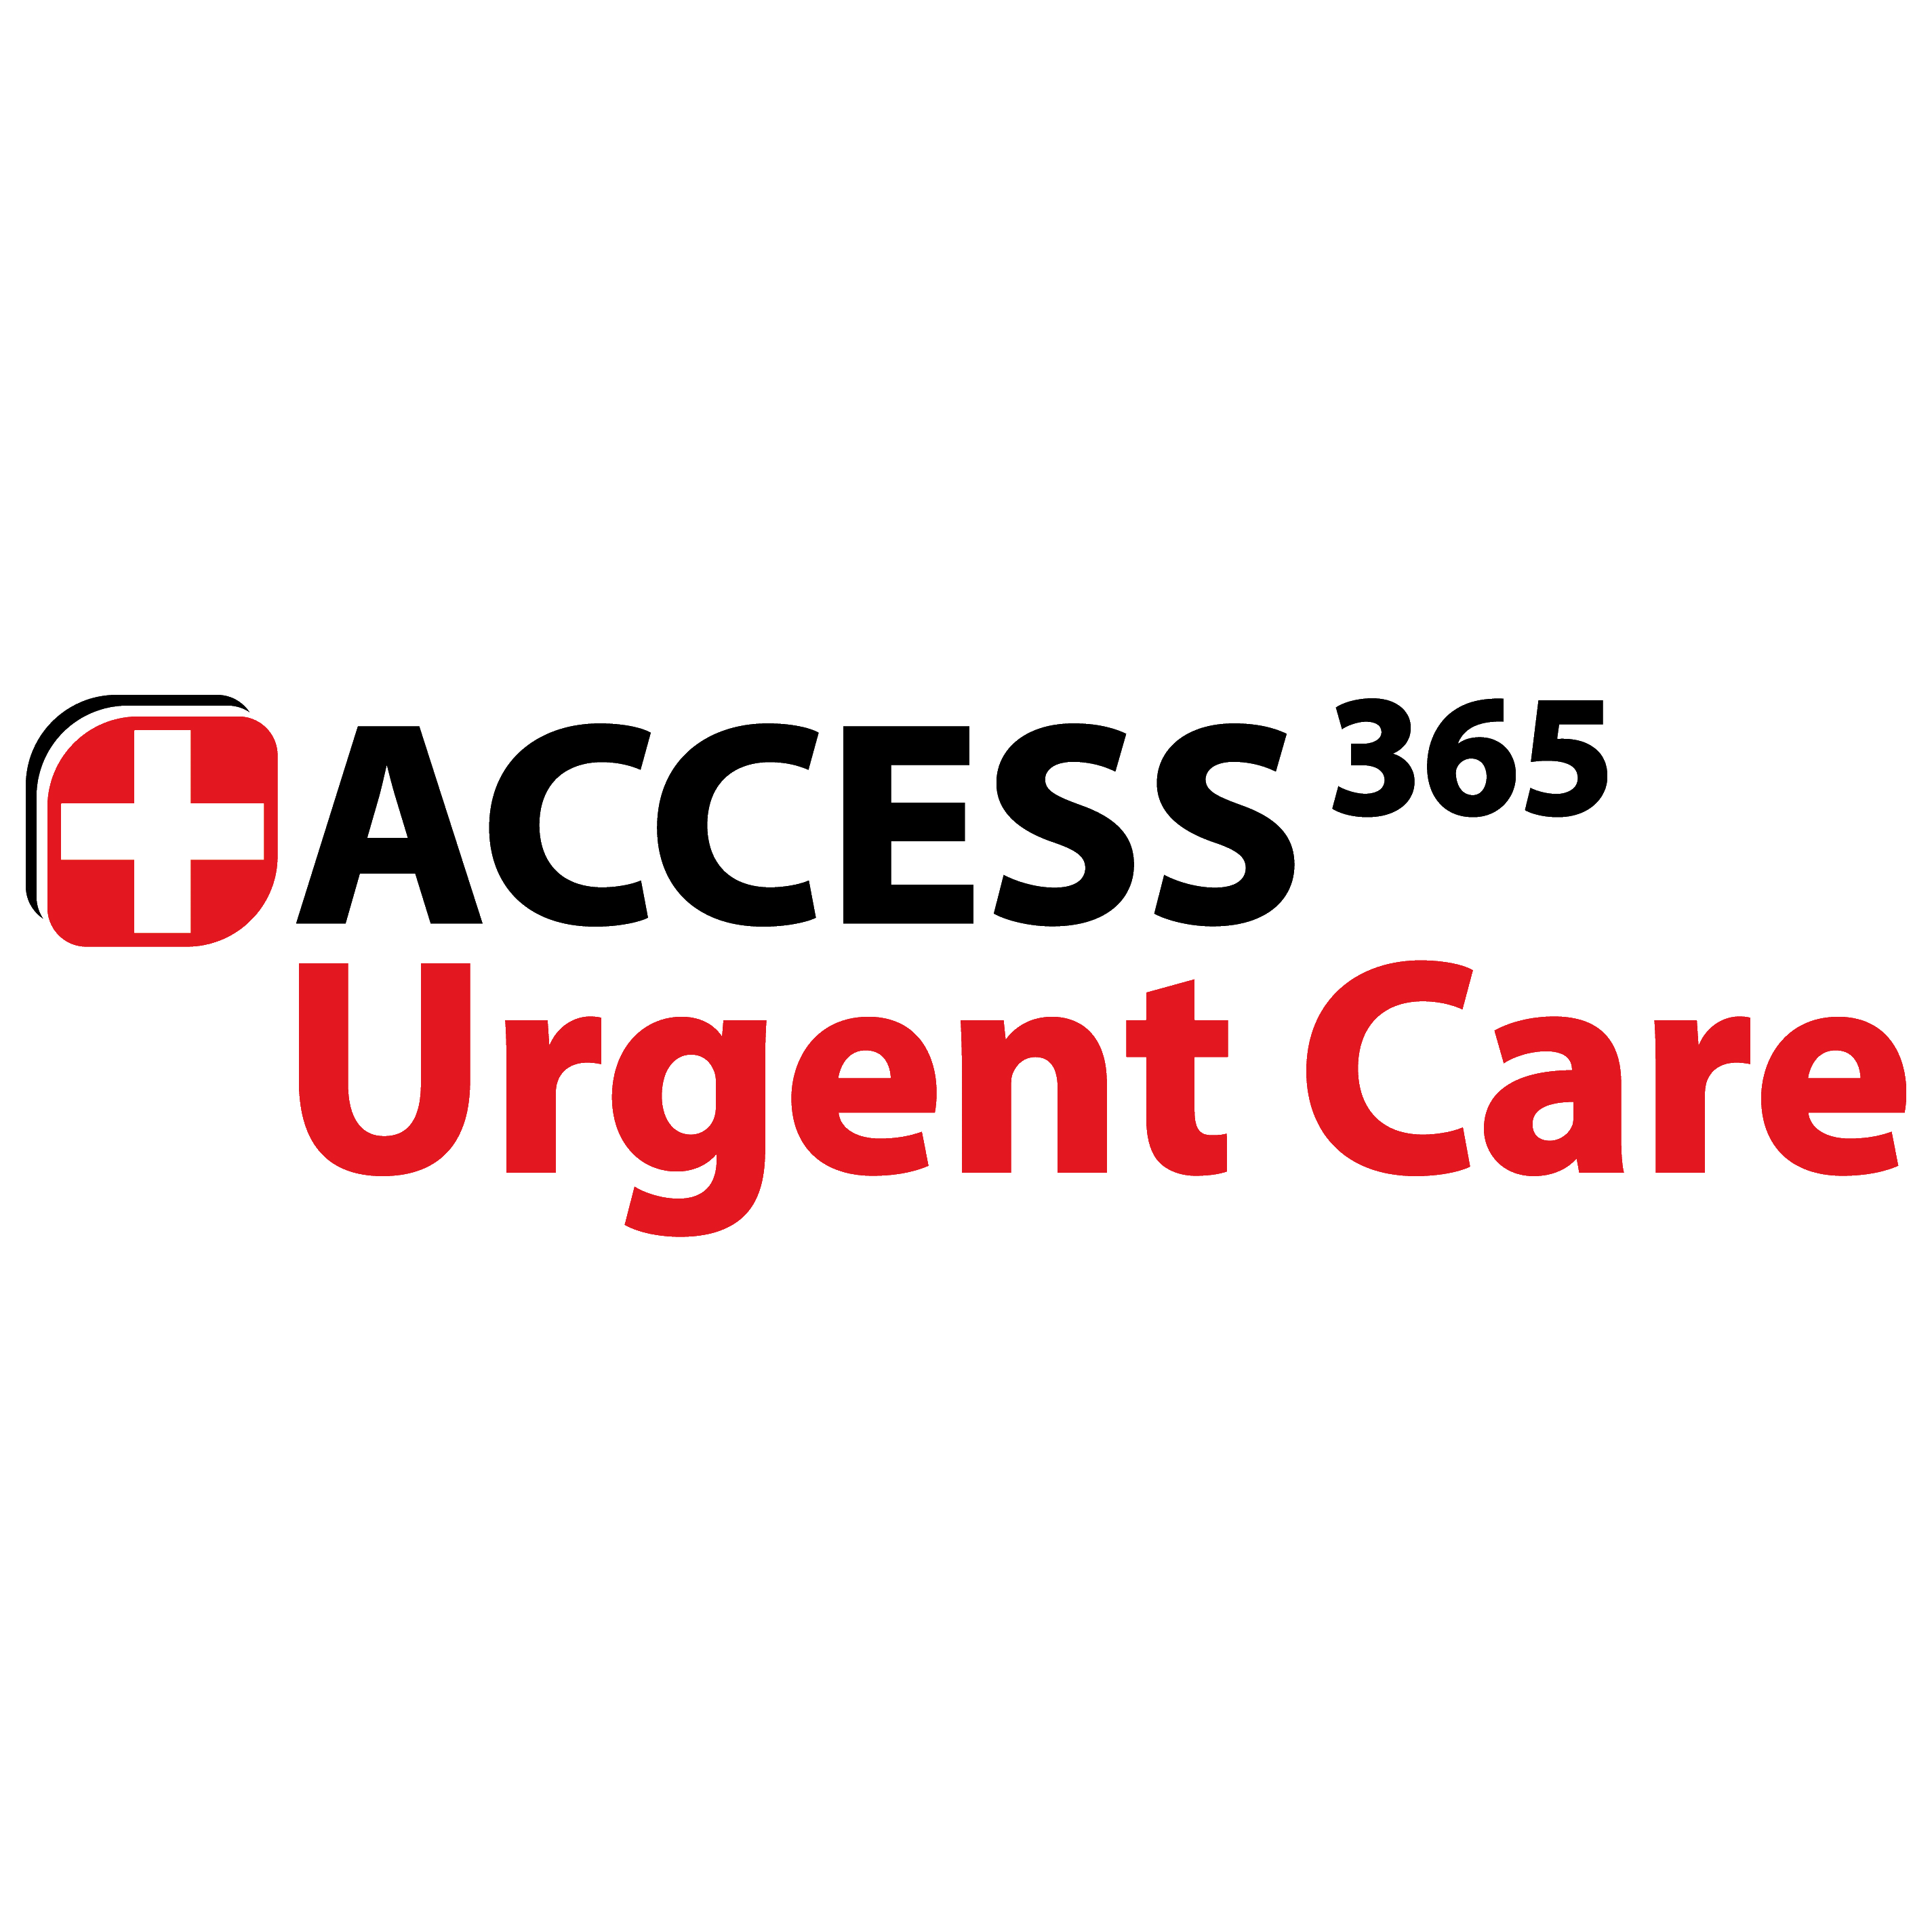 Access 365 Urgent Care image 1